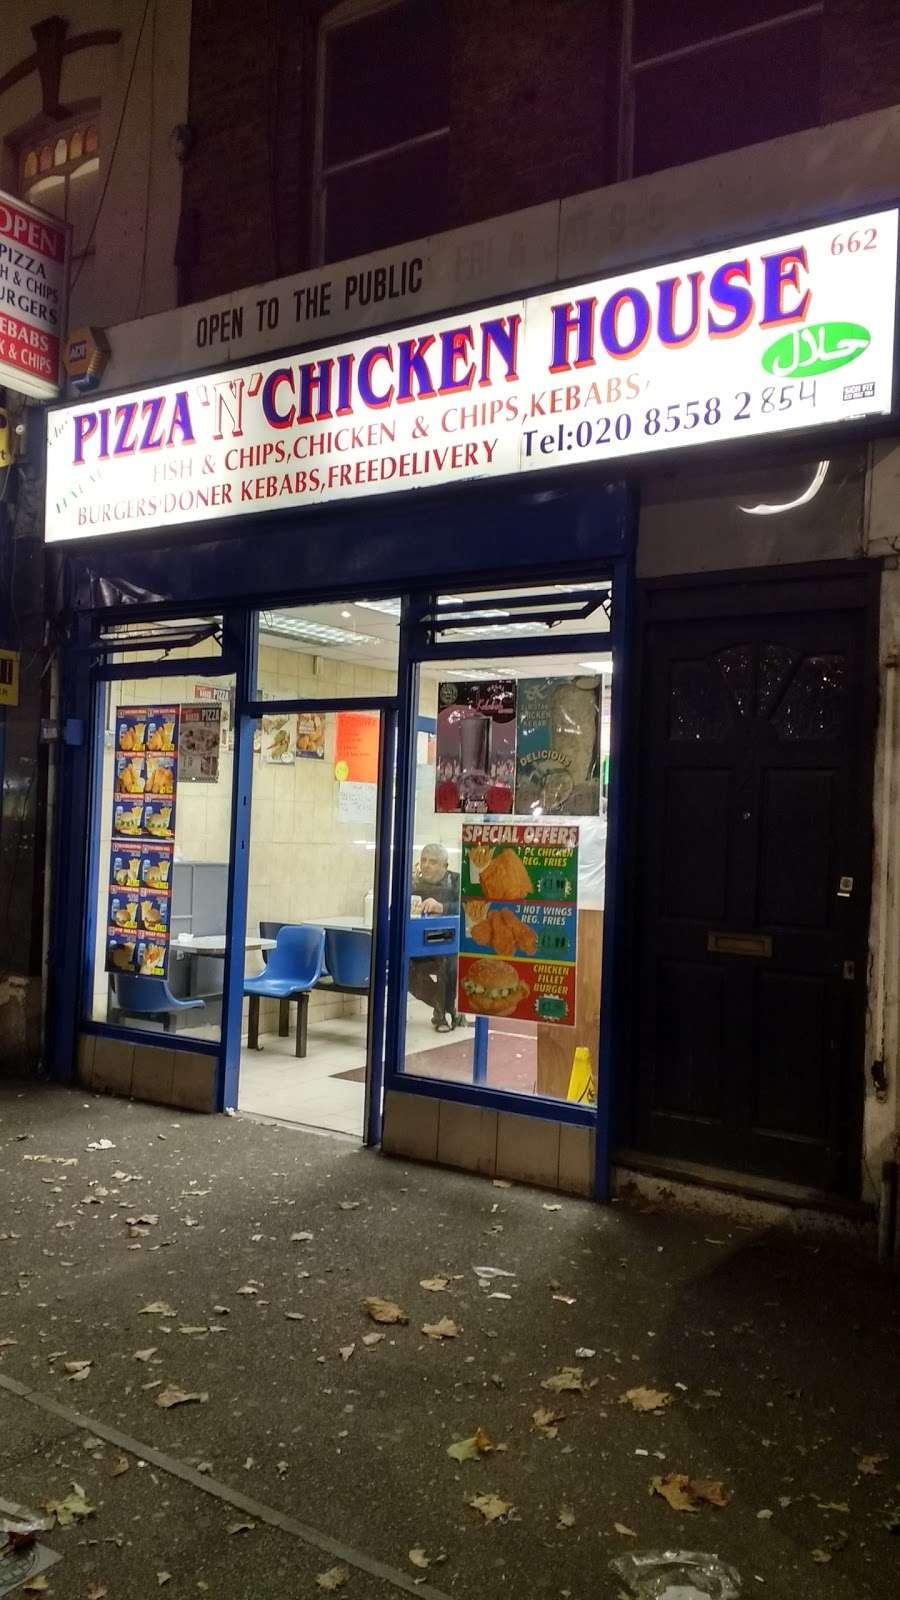 PizzanChicken House - meal takeaway  | Photo 1 of 1 | Address: 662 High Rd Leyton, London E10 6JP, UK | Phone: 020 8558 2854